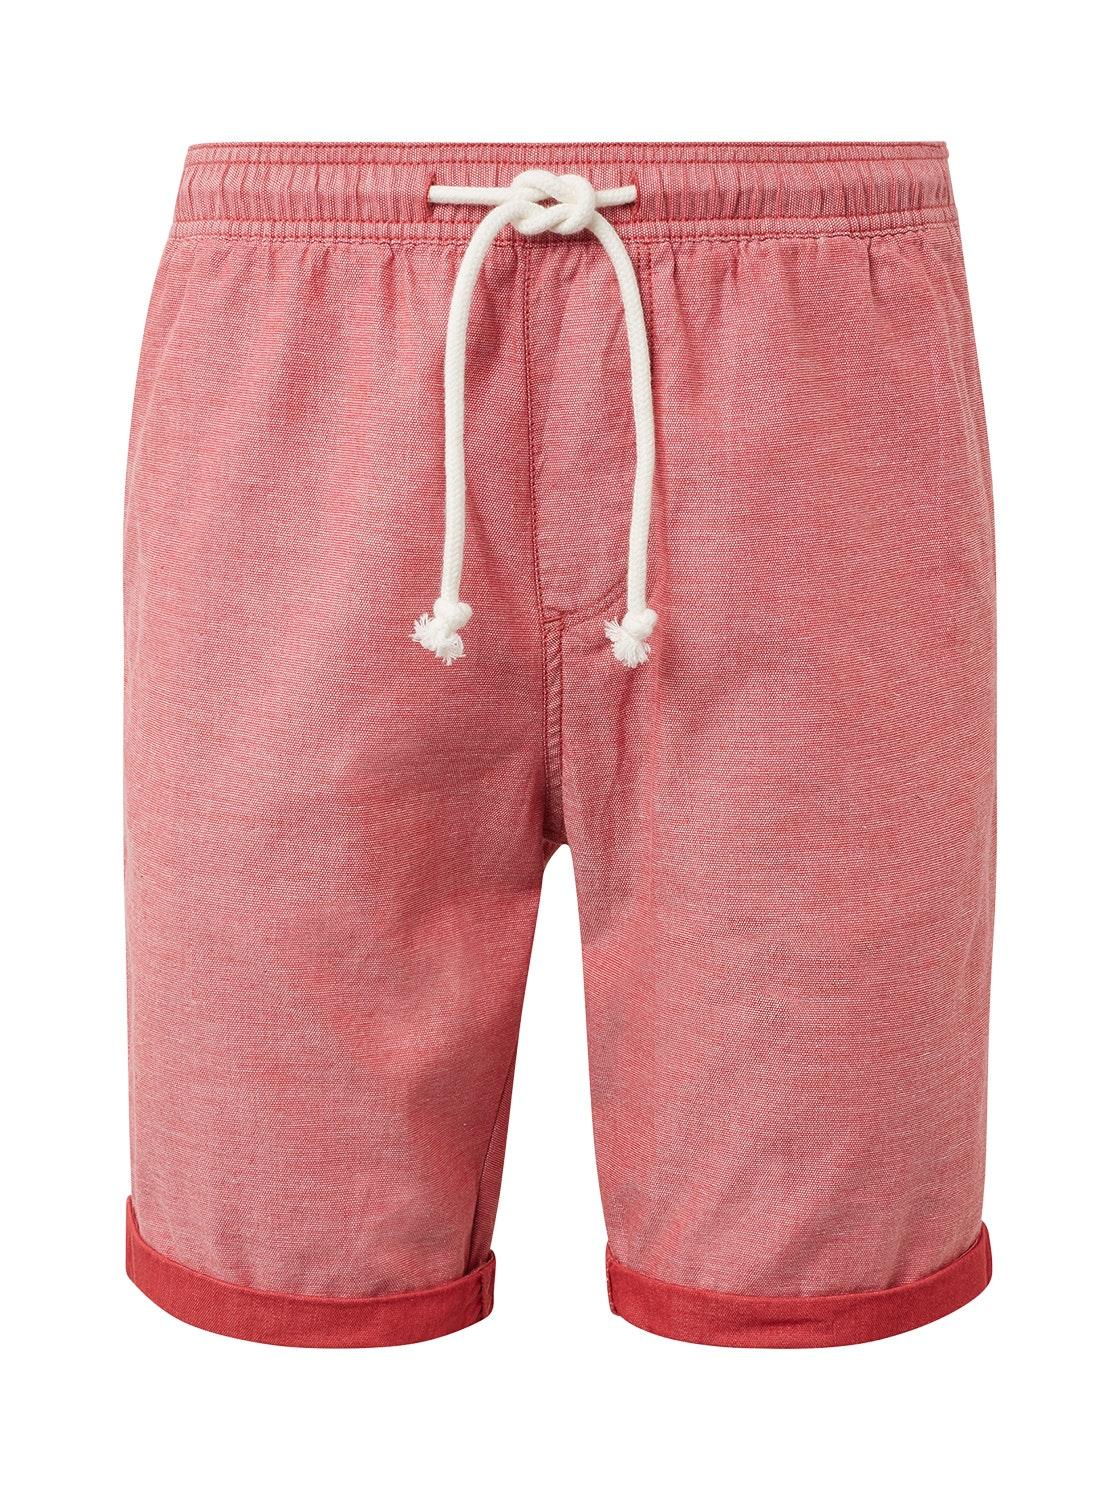 beach shorts yarn dye, red yarndye pique             Red